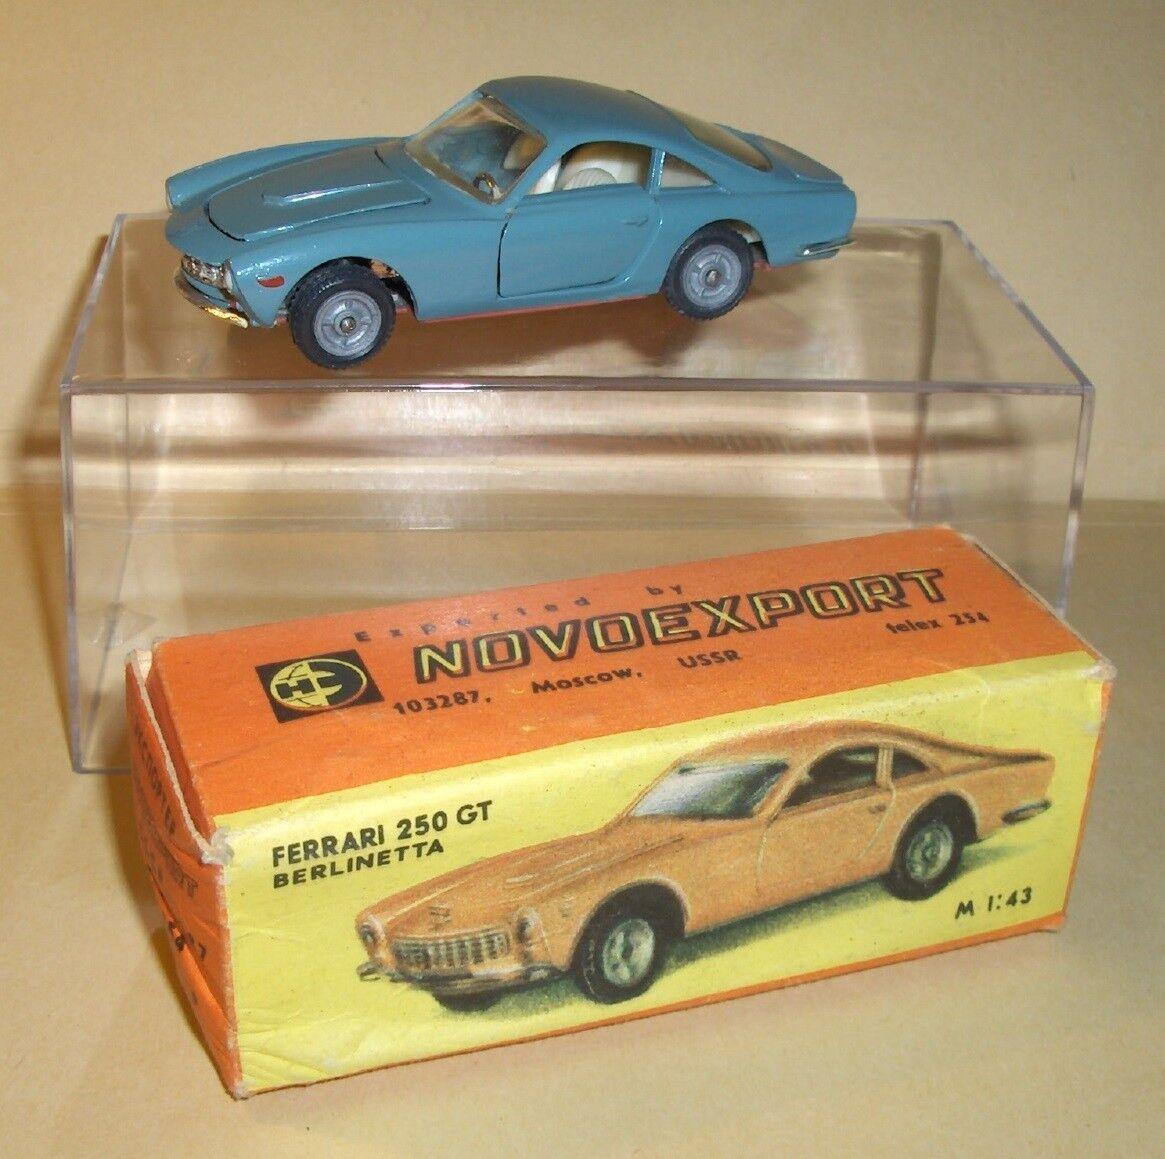 VINTAGE USSR FERRARI 250 GT BERLINETTA by NOVOEXPORT - Mint Boxed